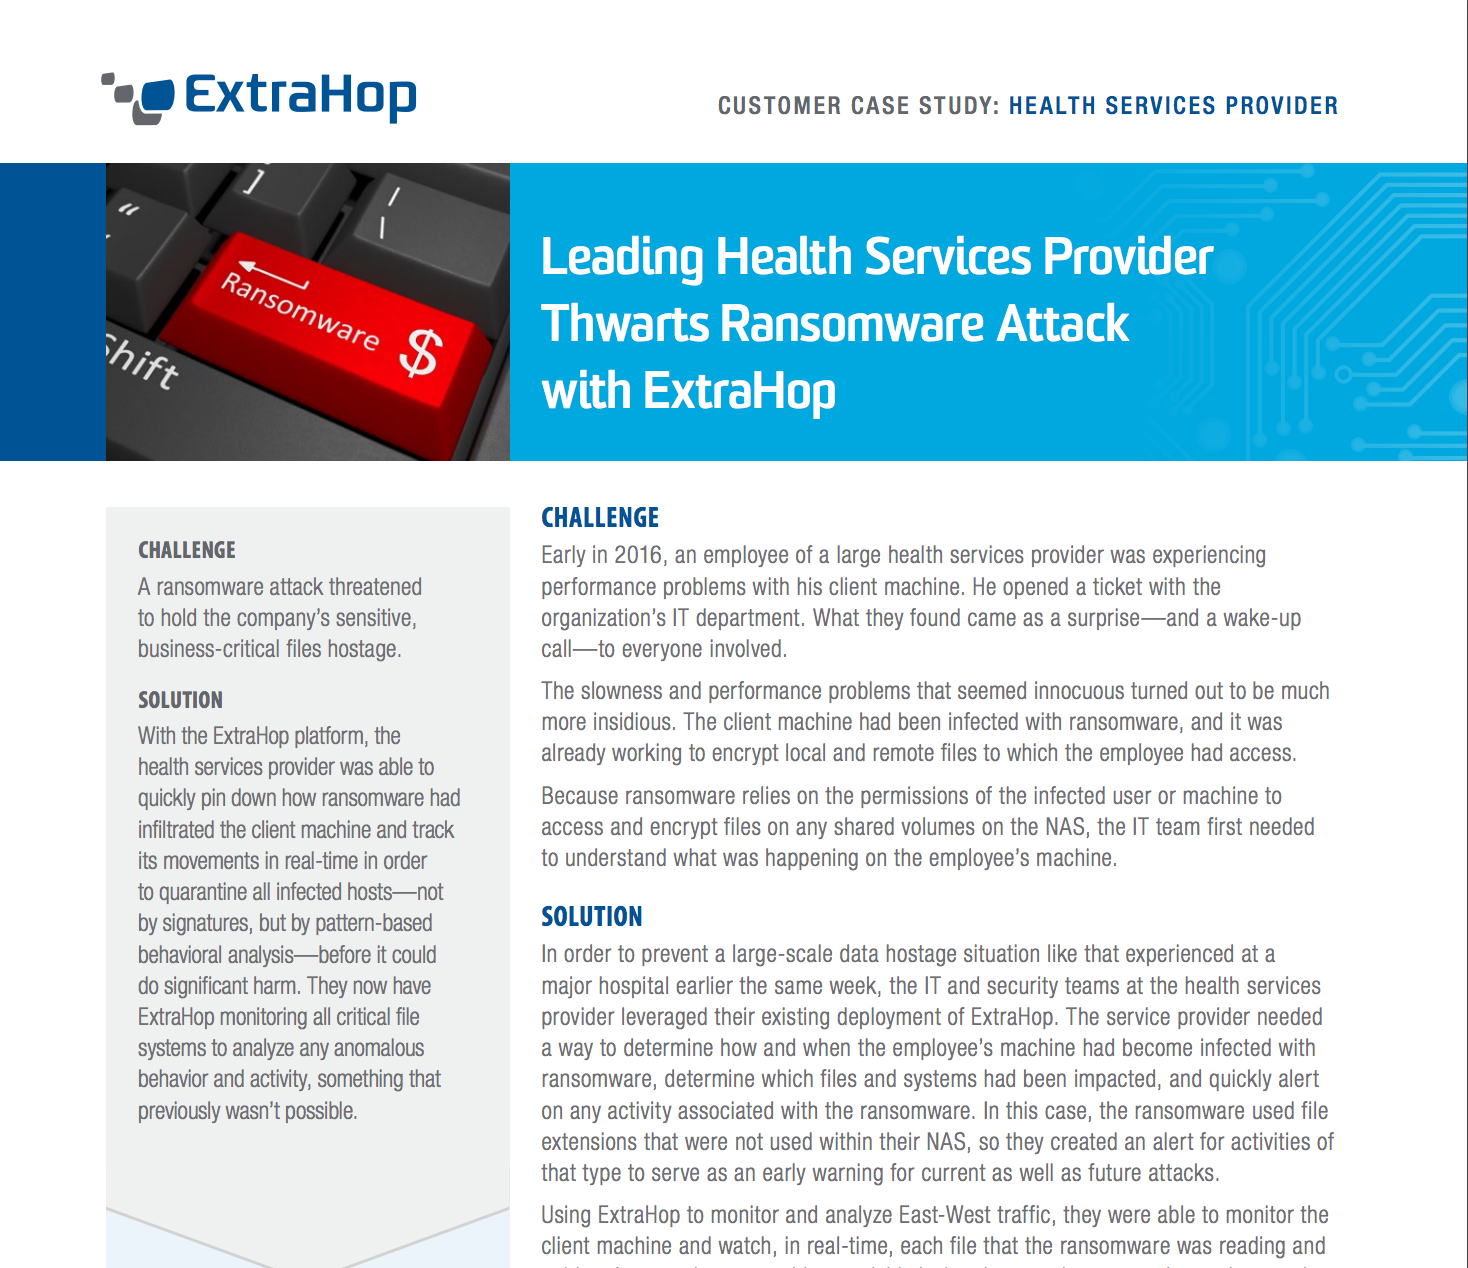 Health Services Provider